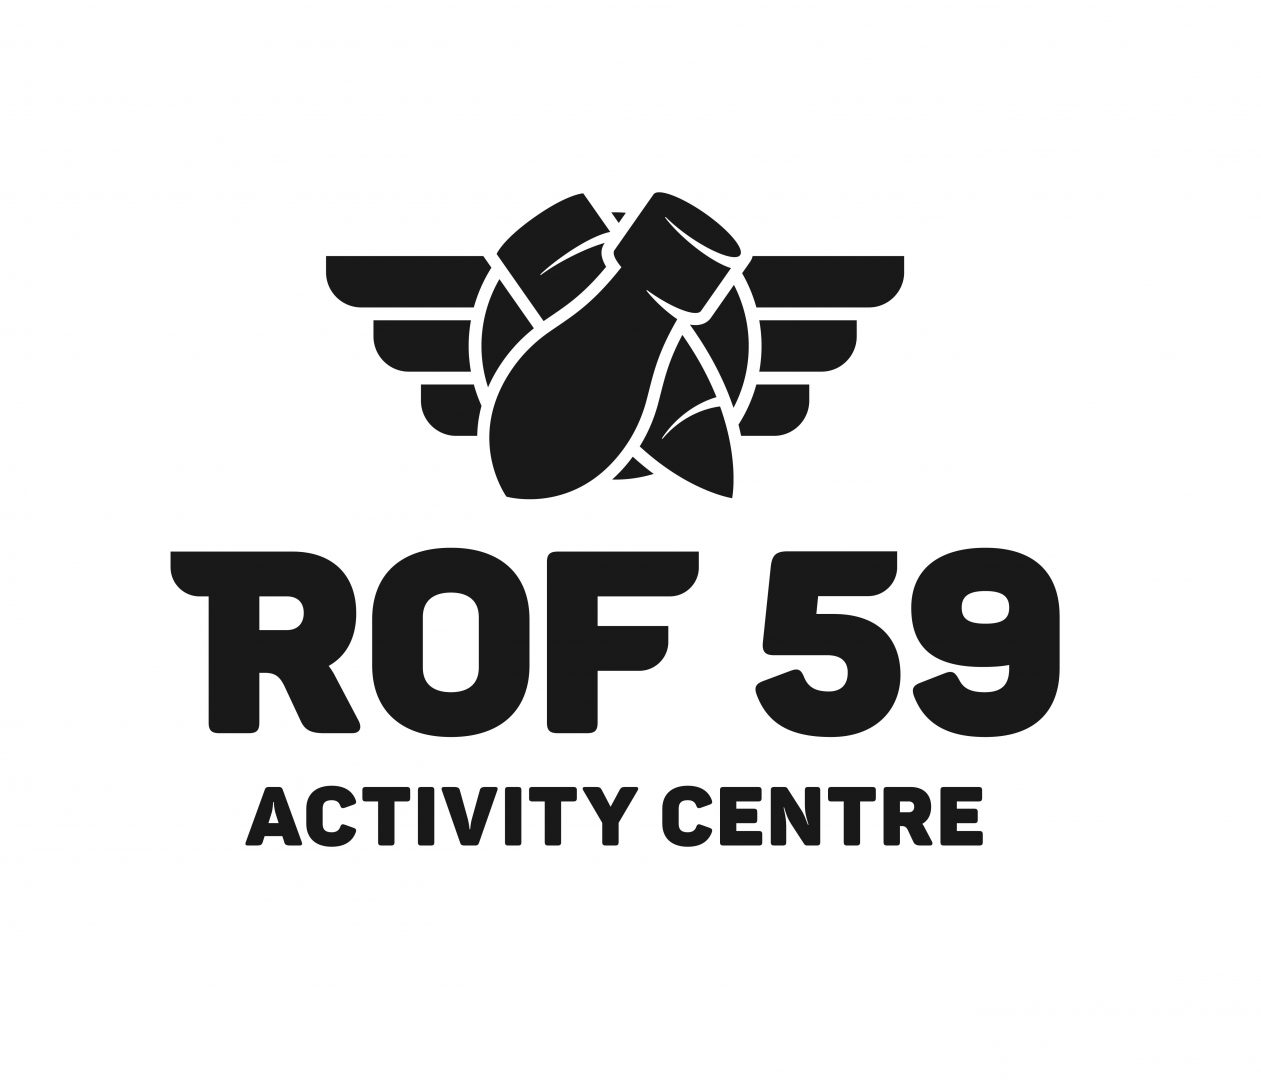 ROF 59